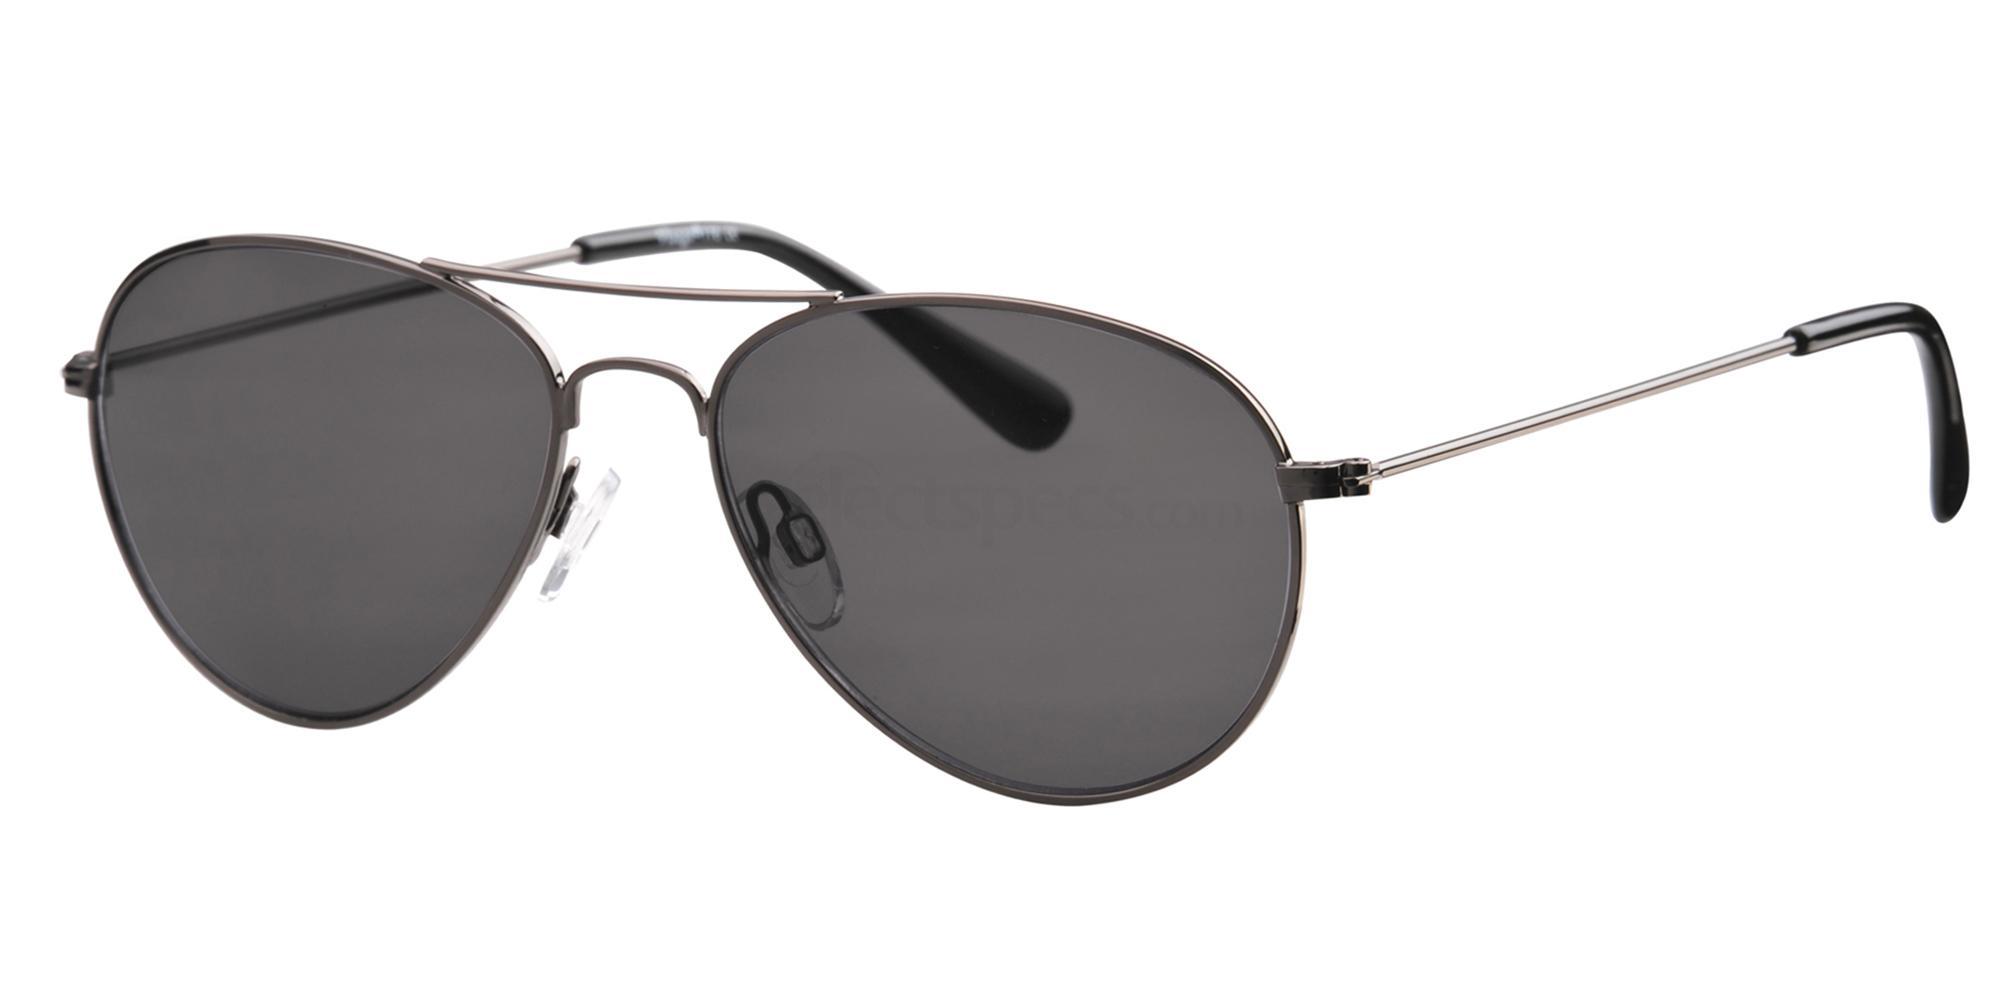 C01 VS176 Sunglasses, Visage